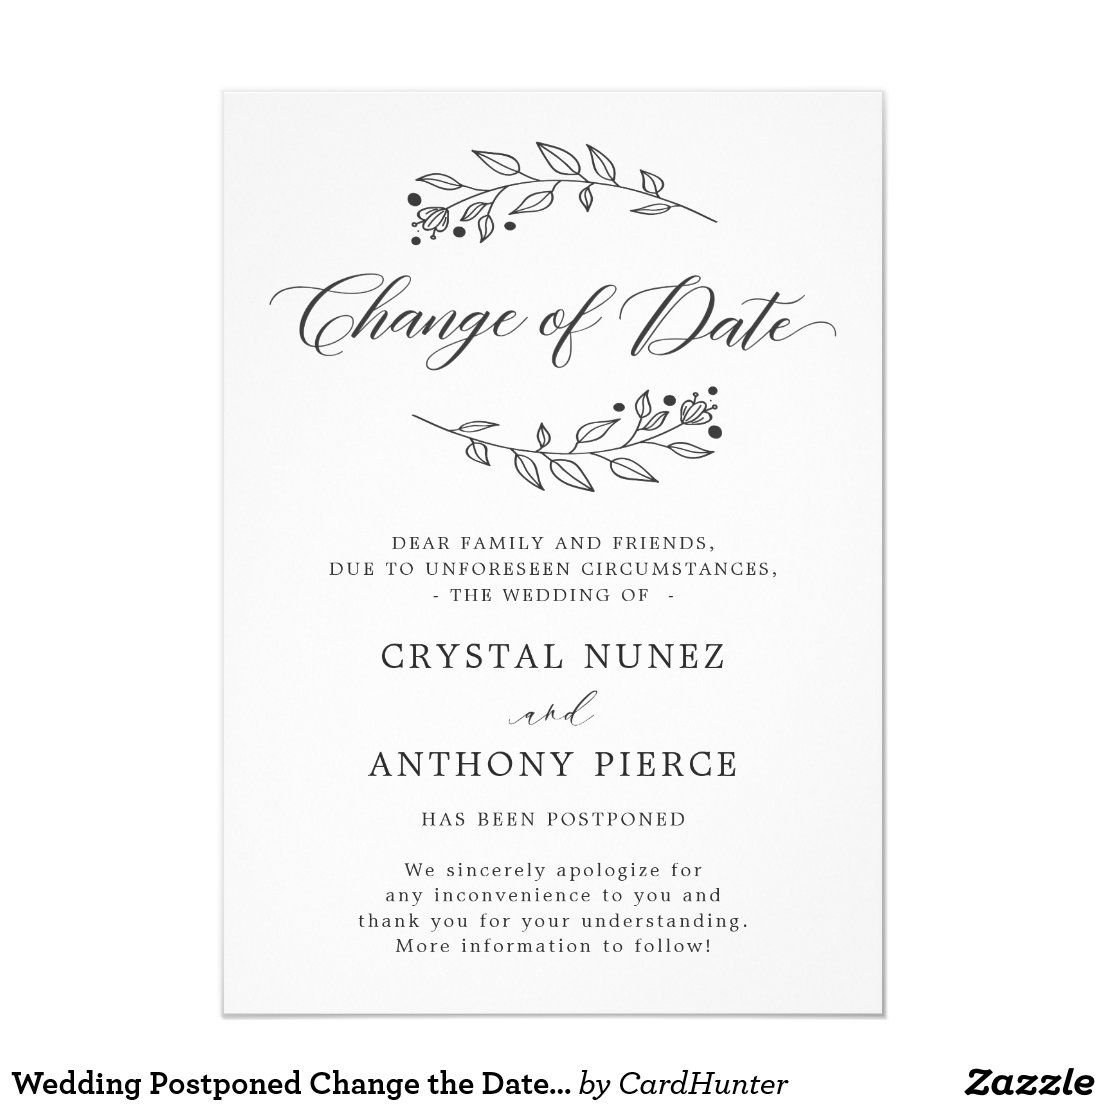 Wedding Postponed Change The Date Announcement Zazzle Com In 2020 Wedding Announcements Wording Wedding Announcements Templates Cheap Wedding Invitations